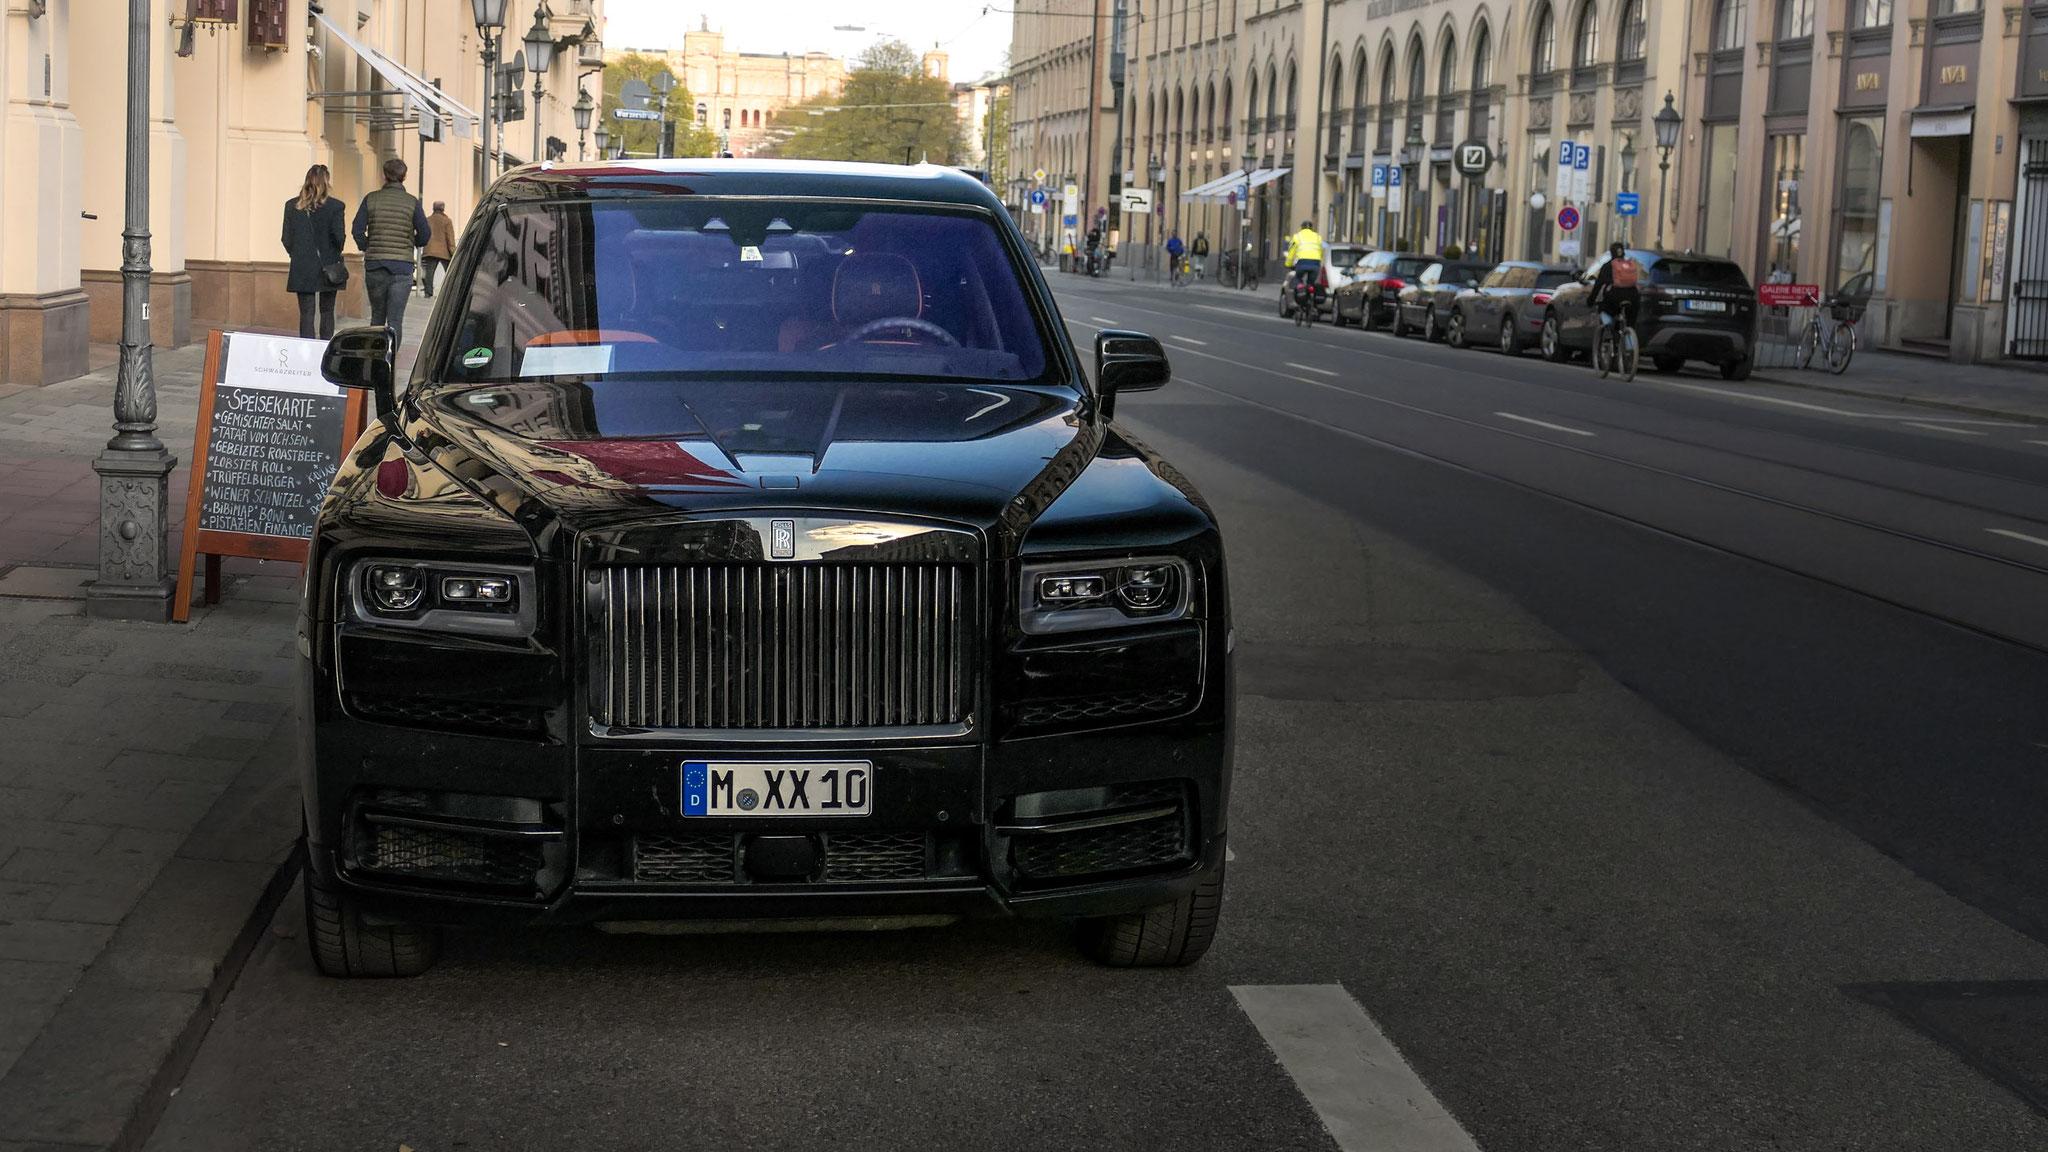 Rolls Royce Cullinan Black Badge - M-XX-10